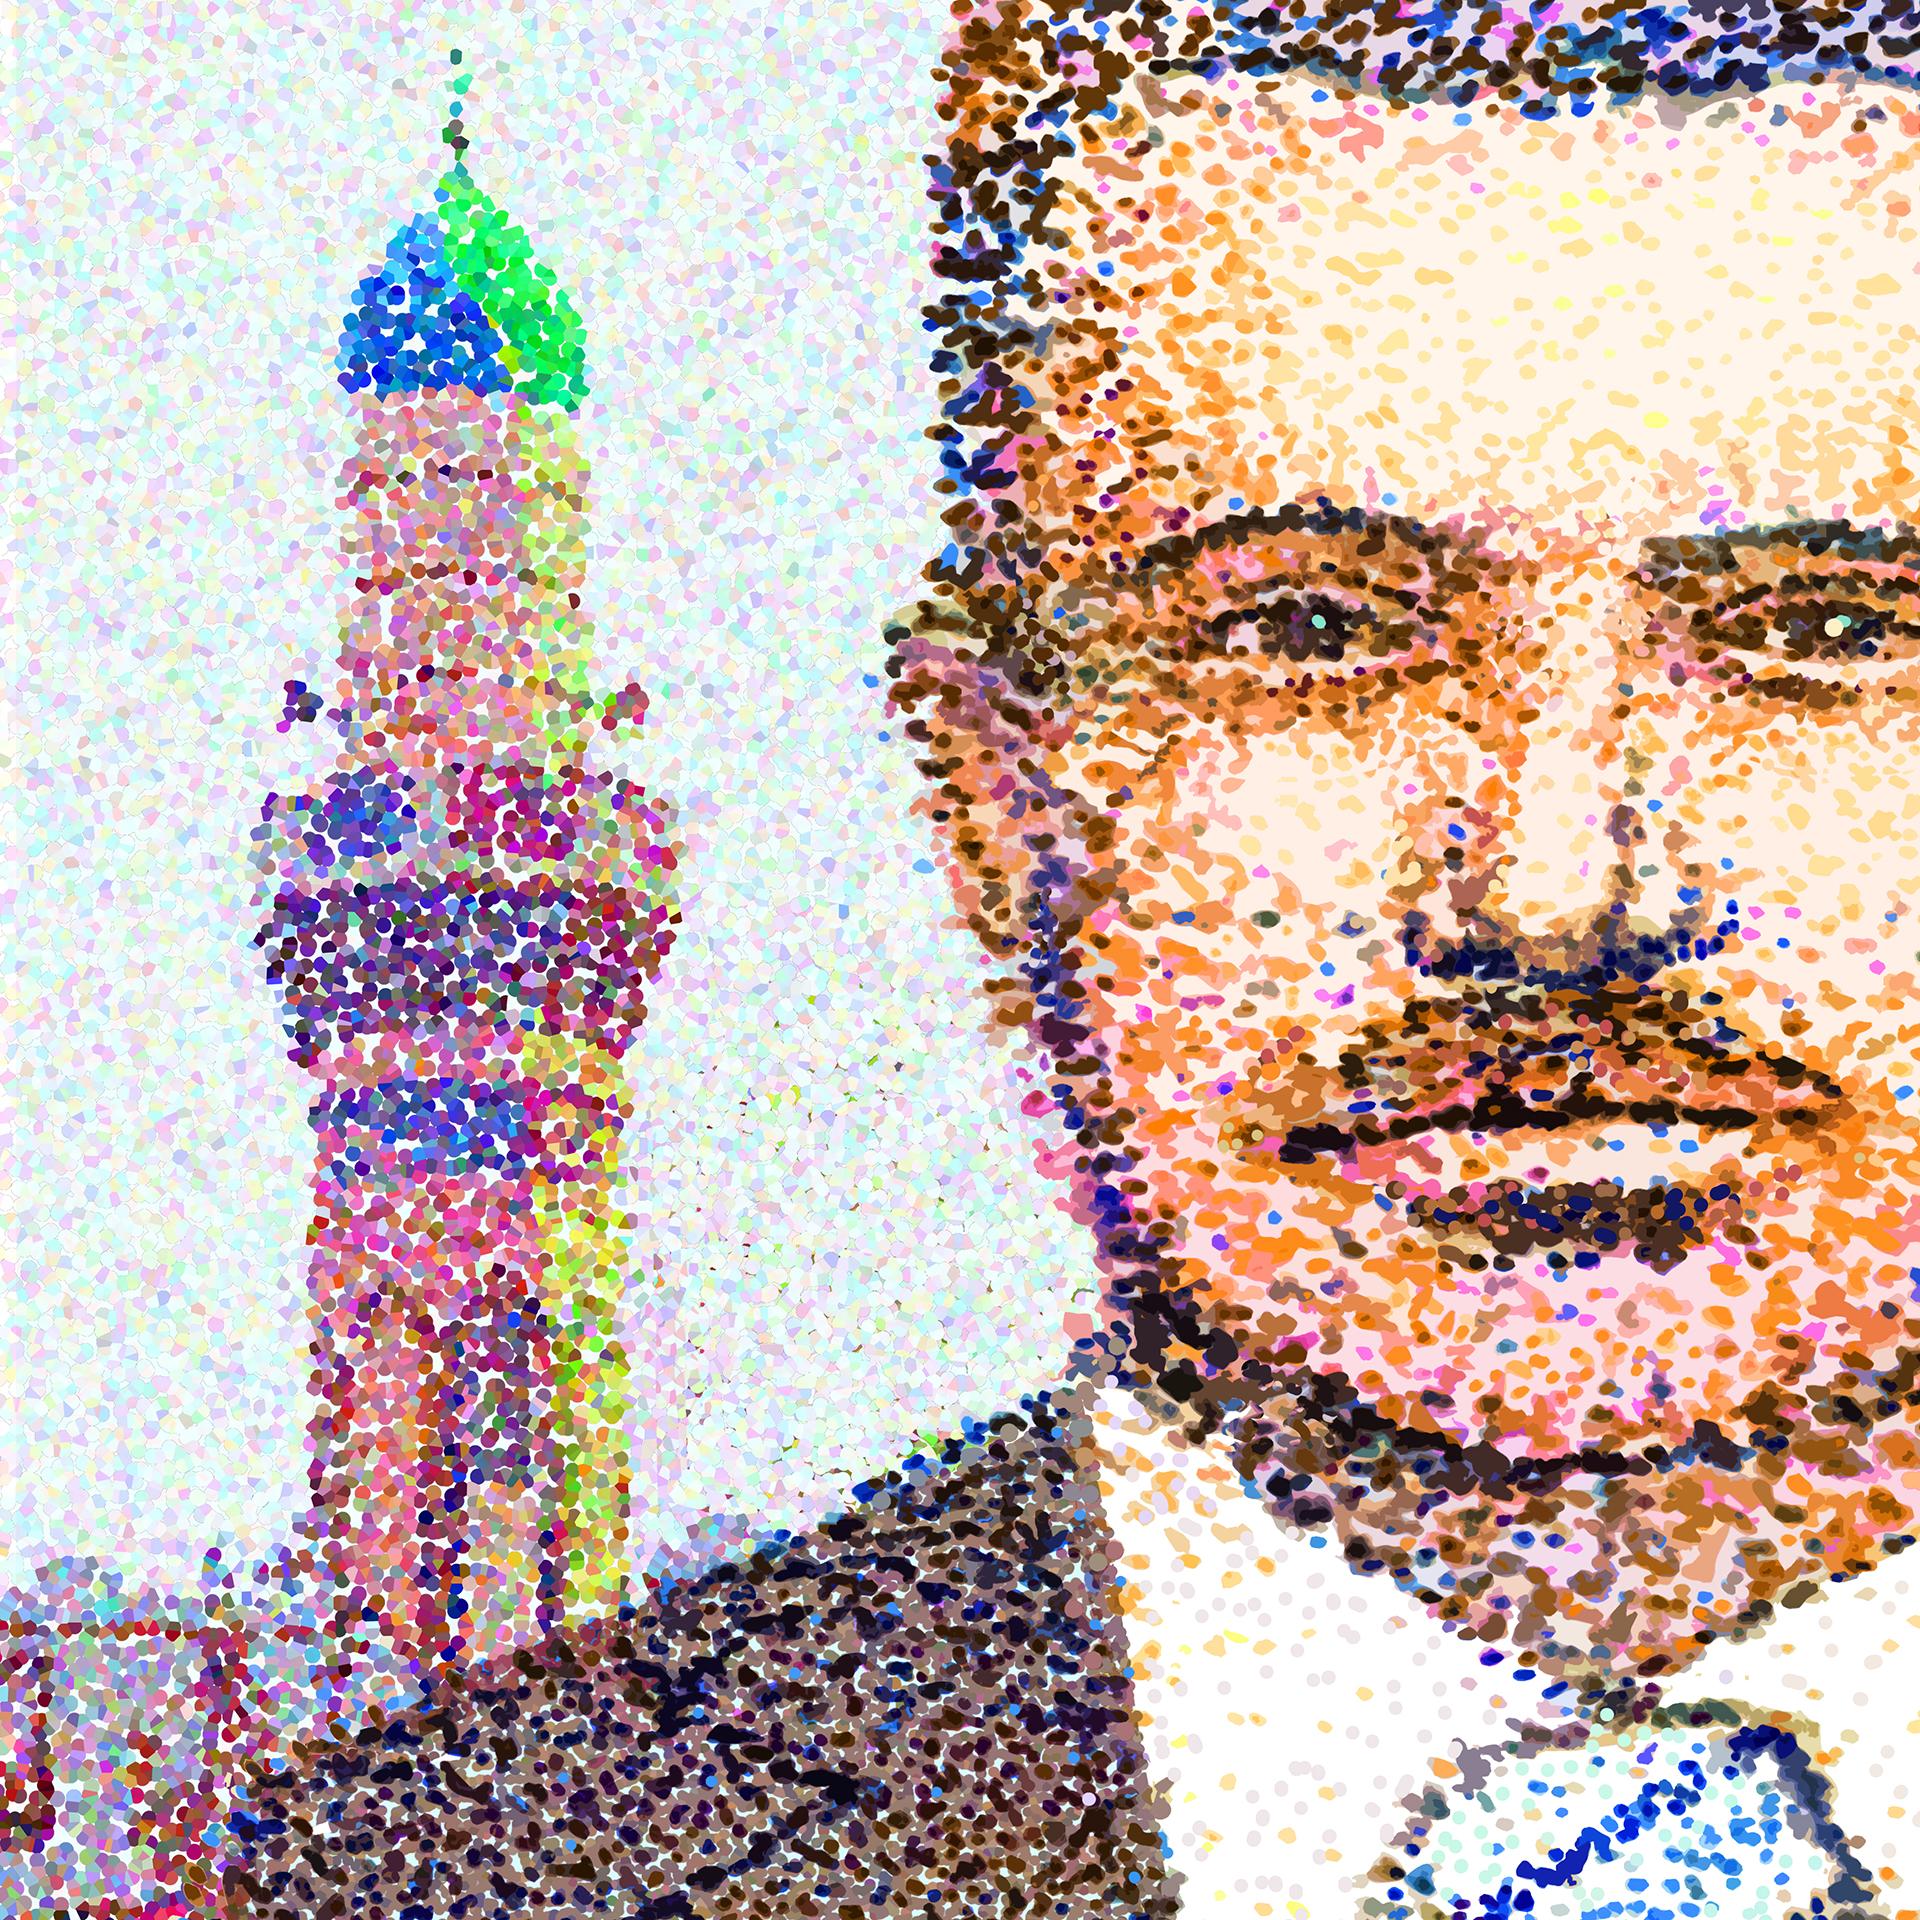 Abdul-Hussein Khazal